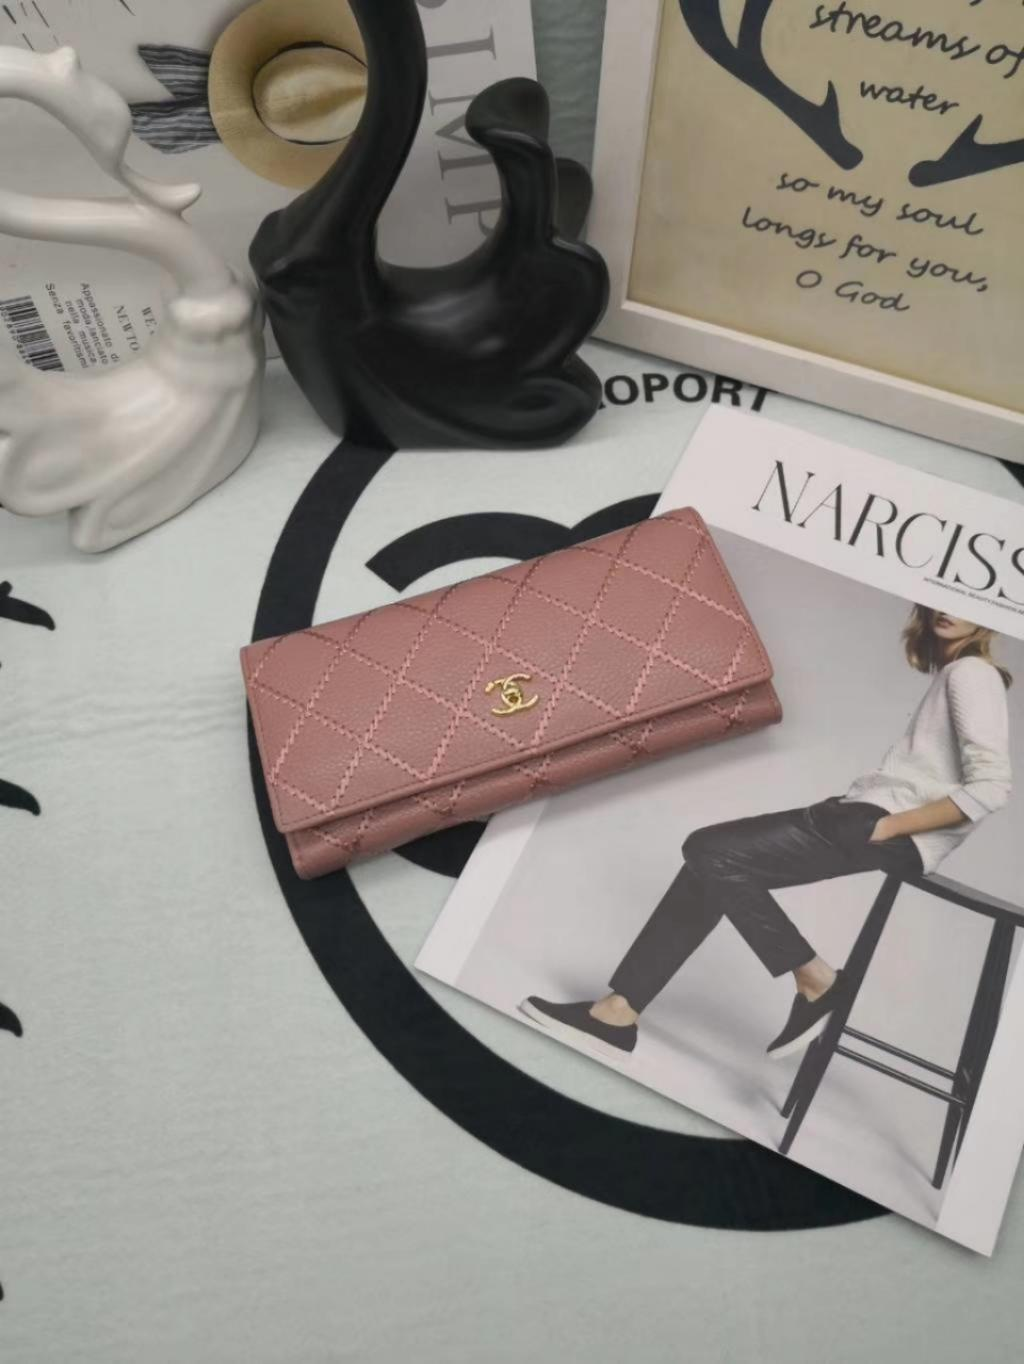 b26d48383e03 Chanel シャネル レディース 財布 通販大丈夫 ブランドコピー 日本国内発送 2色